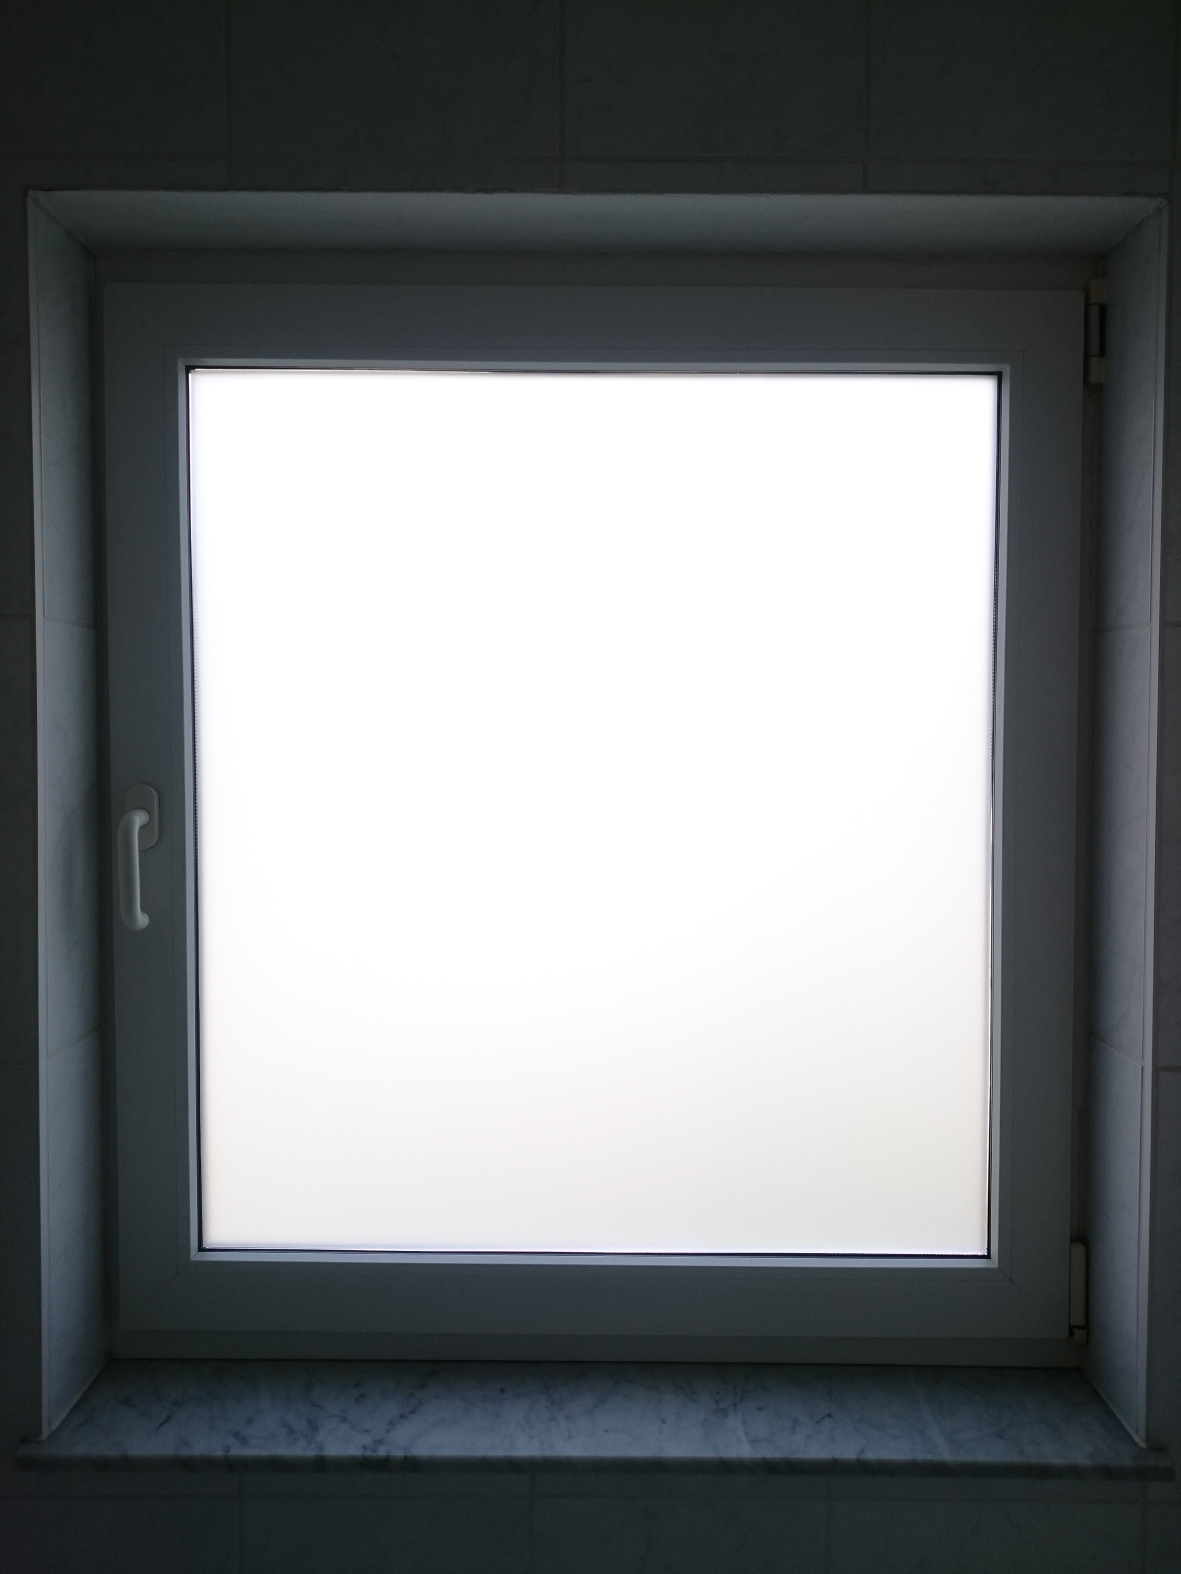 Full Size of Fenster Sichtschutzfolien Innen Sichtschutzfolie Ikea Hornbach Badezimmerfenster Obi Melinera Lidl Anbringen Antistatisch Blickdicht Fensterfolie Bad Spiegel Fenster Fenster Sichtschutzfolie